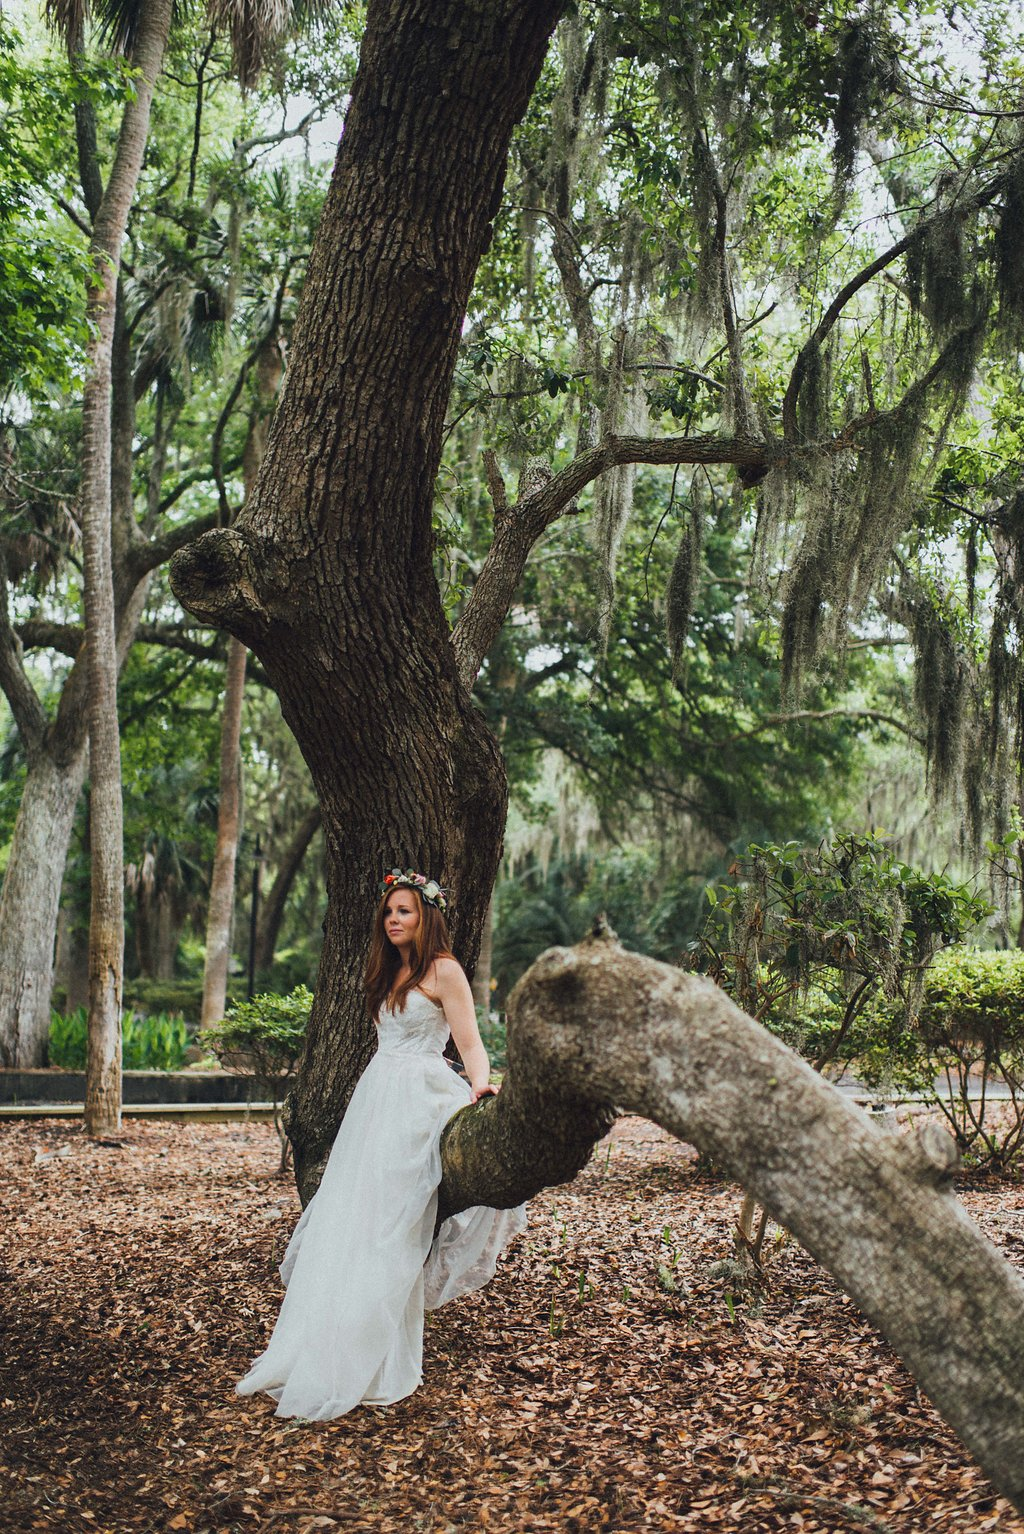 Urban-Poppy-Southern-Wedding-Mallory-and-Justin-photography-ivory-and-beau-bridal-boutique-sarah-seven-marion-boho-bride-indie-bride-indie-wedding-dress-savannah-weddings-hilton-head-weddings-beach-wedding-12.jpg